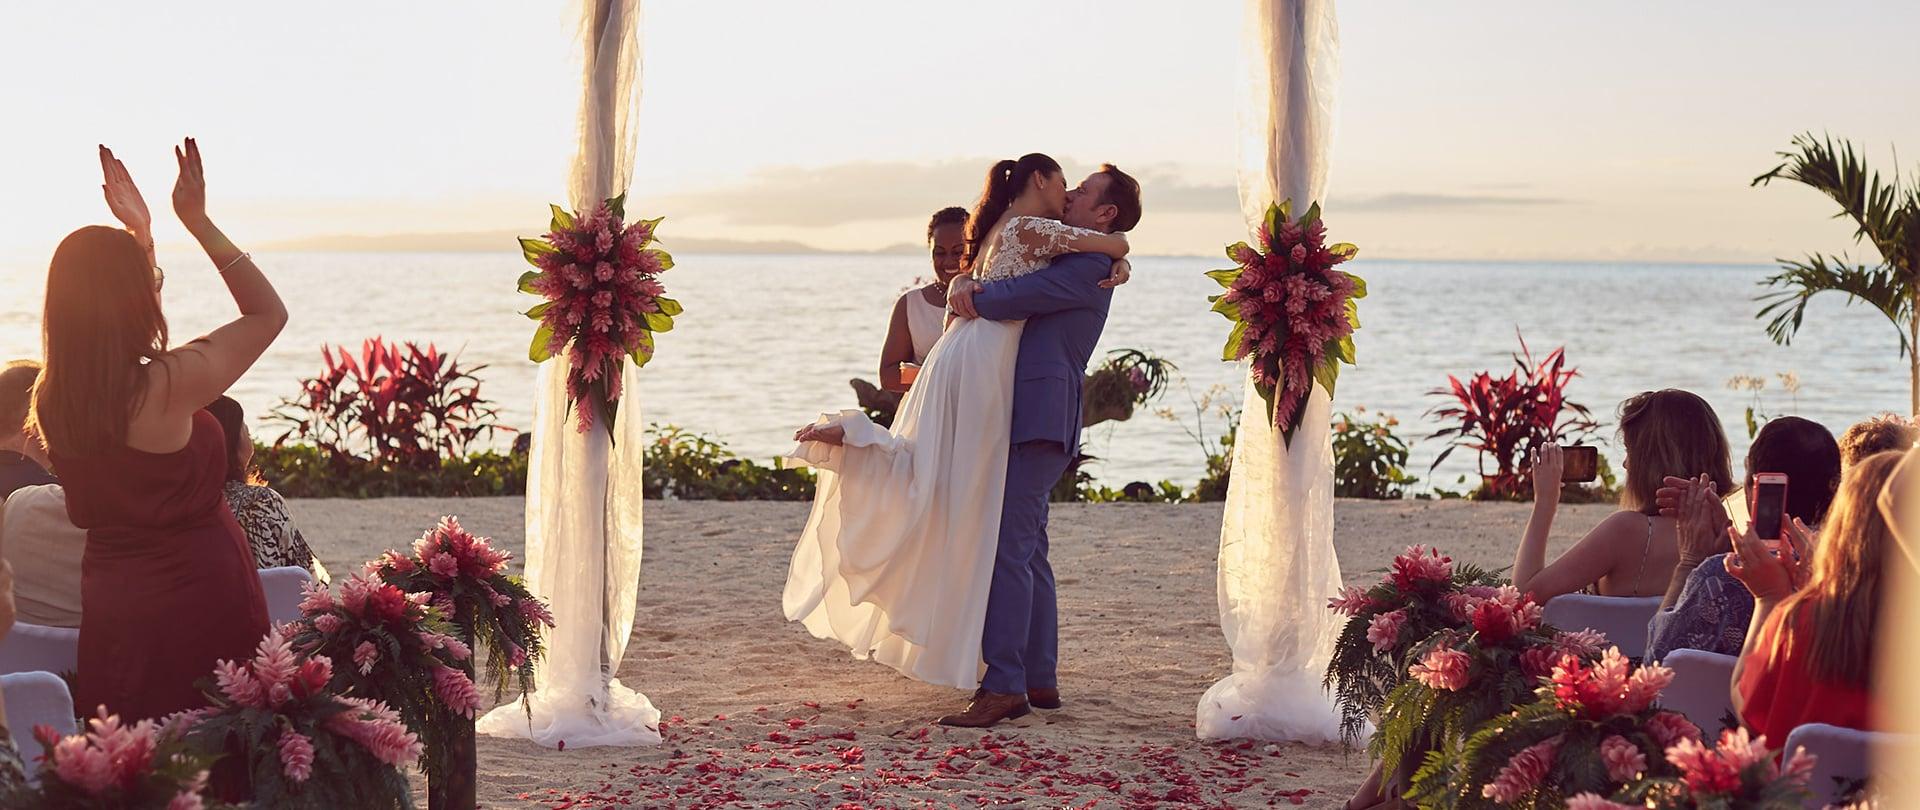 Samantha & Mark Wedding Video Filmed at Laucala Island, Fiji